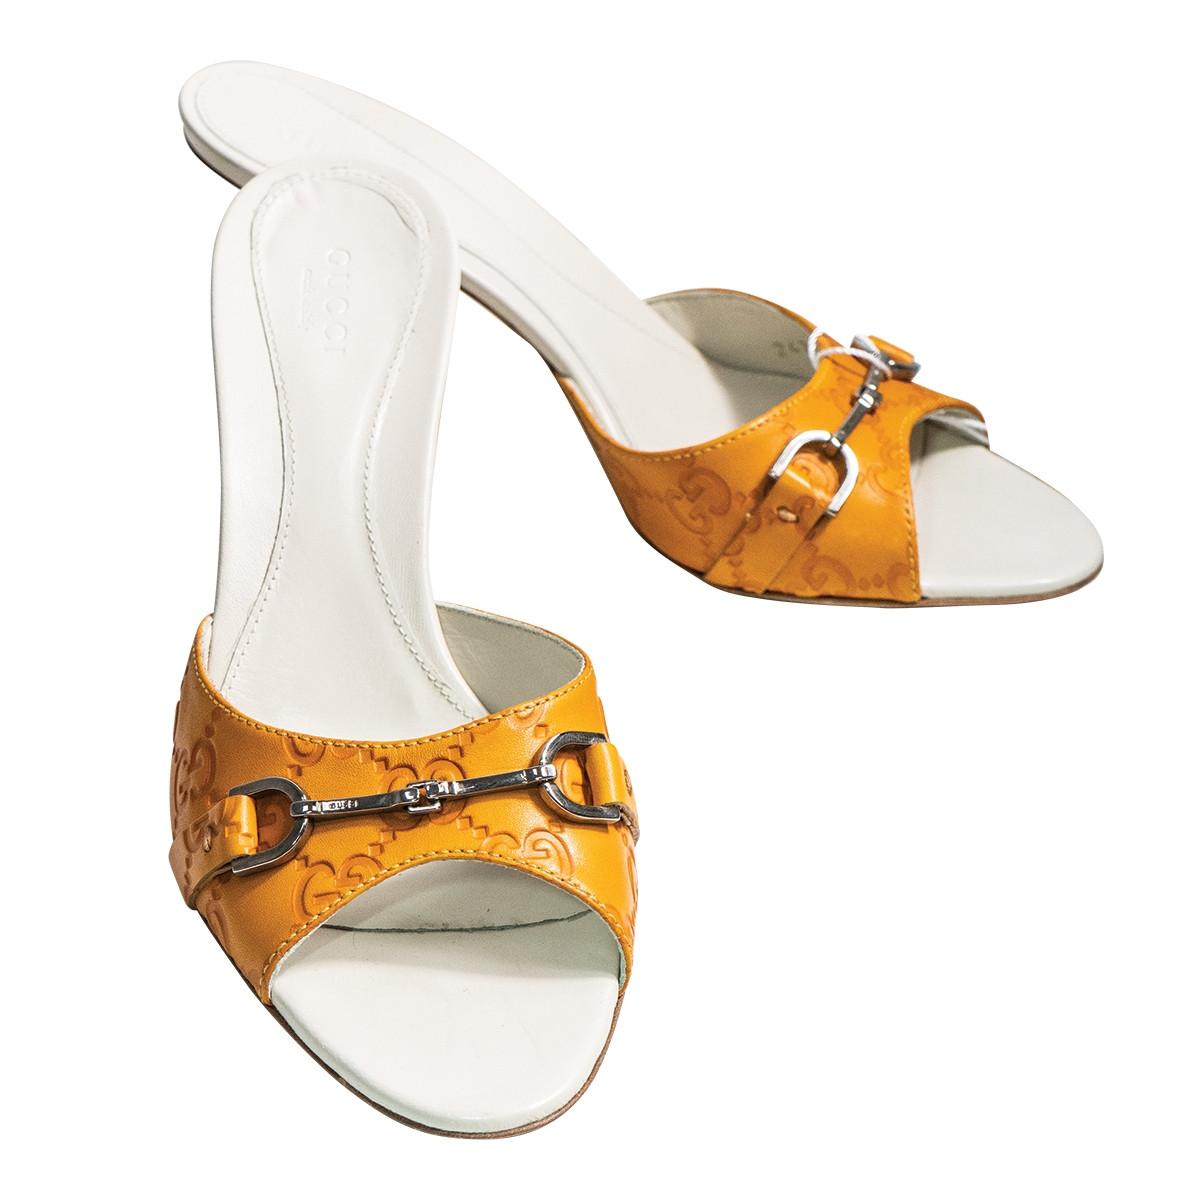 Vintage Gucci Guccissma Buttercup Sandals